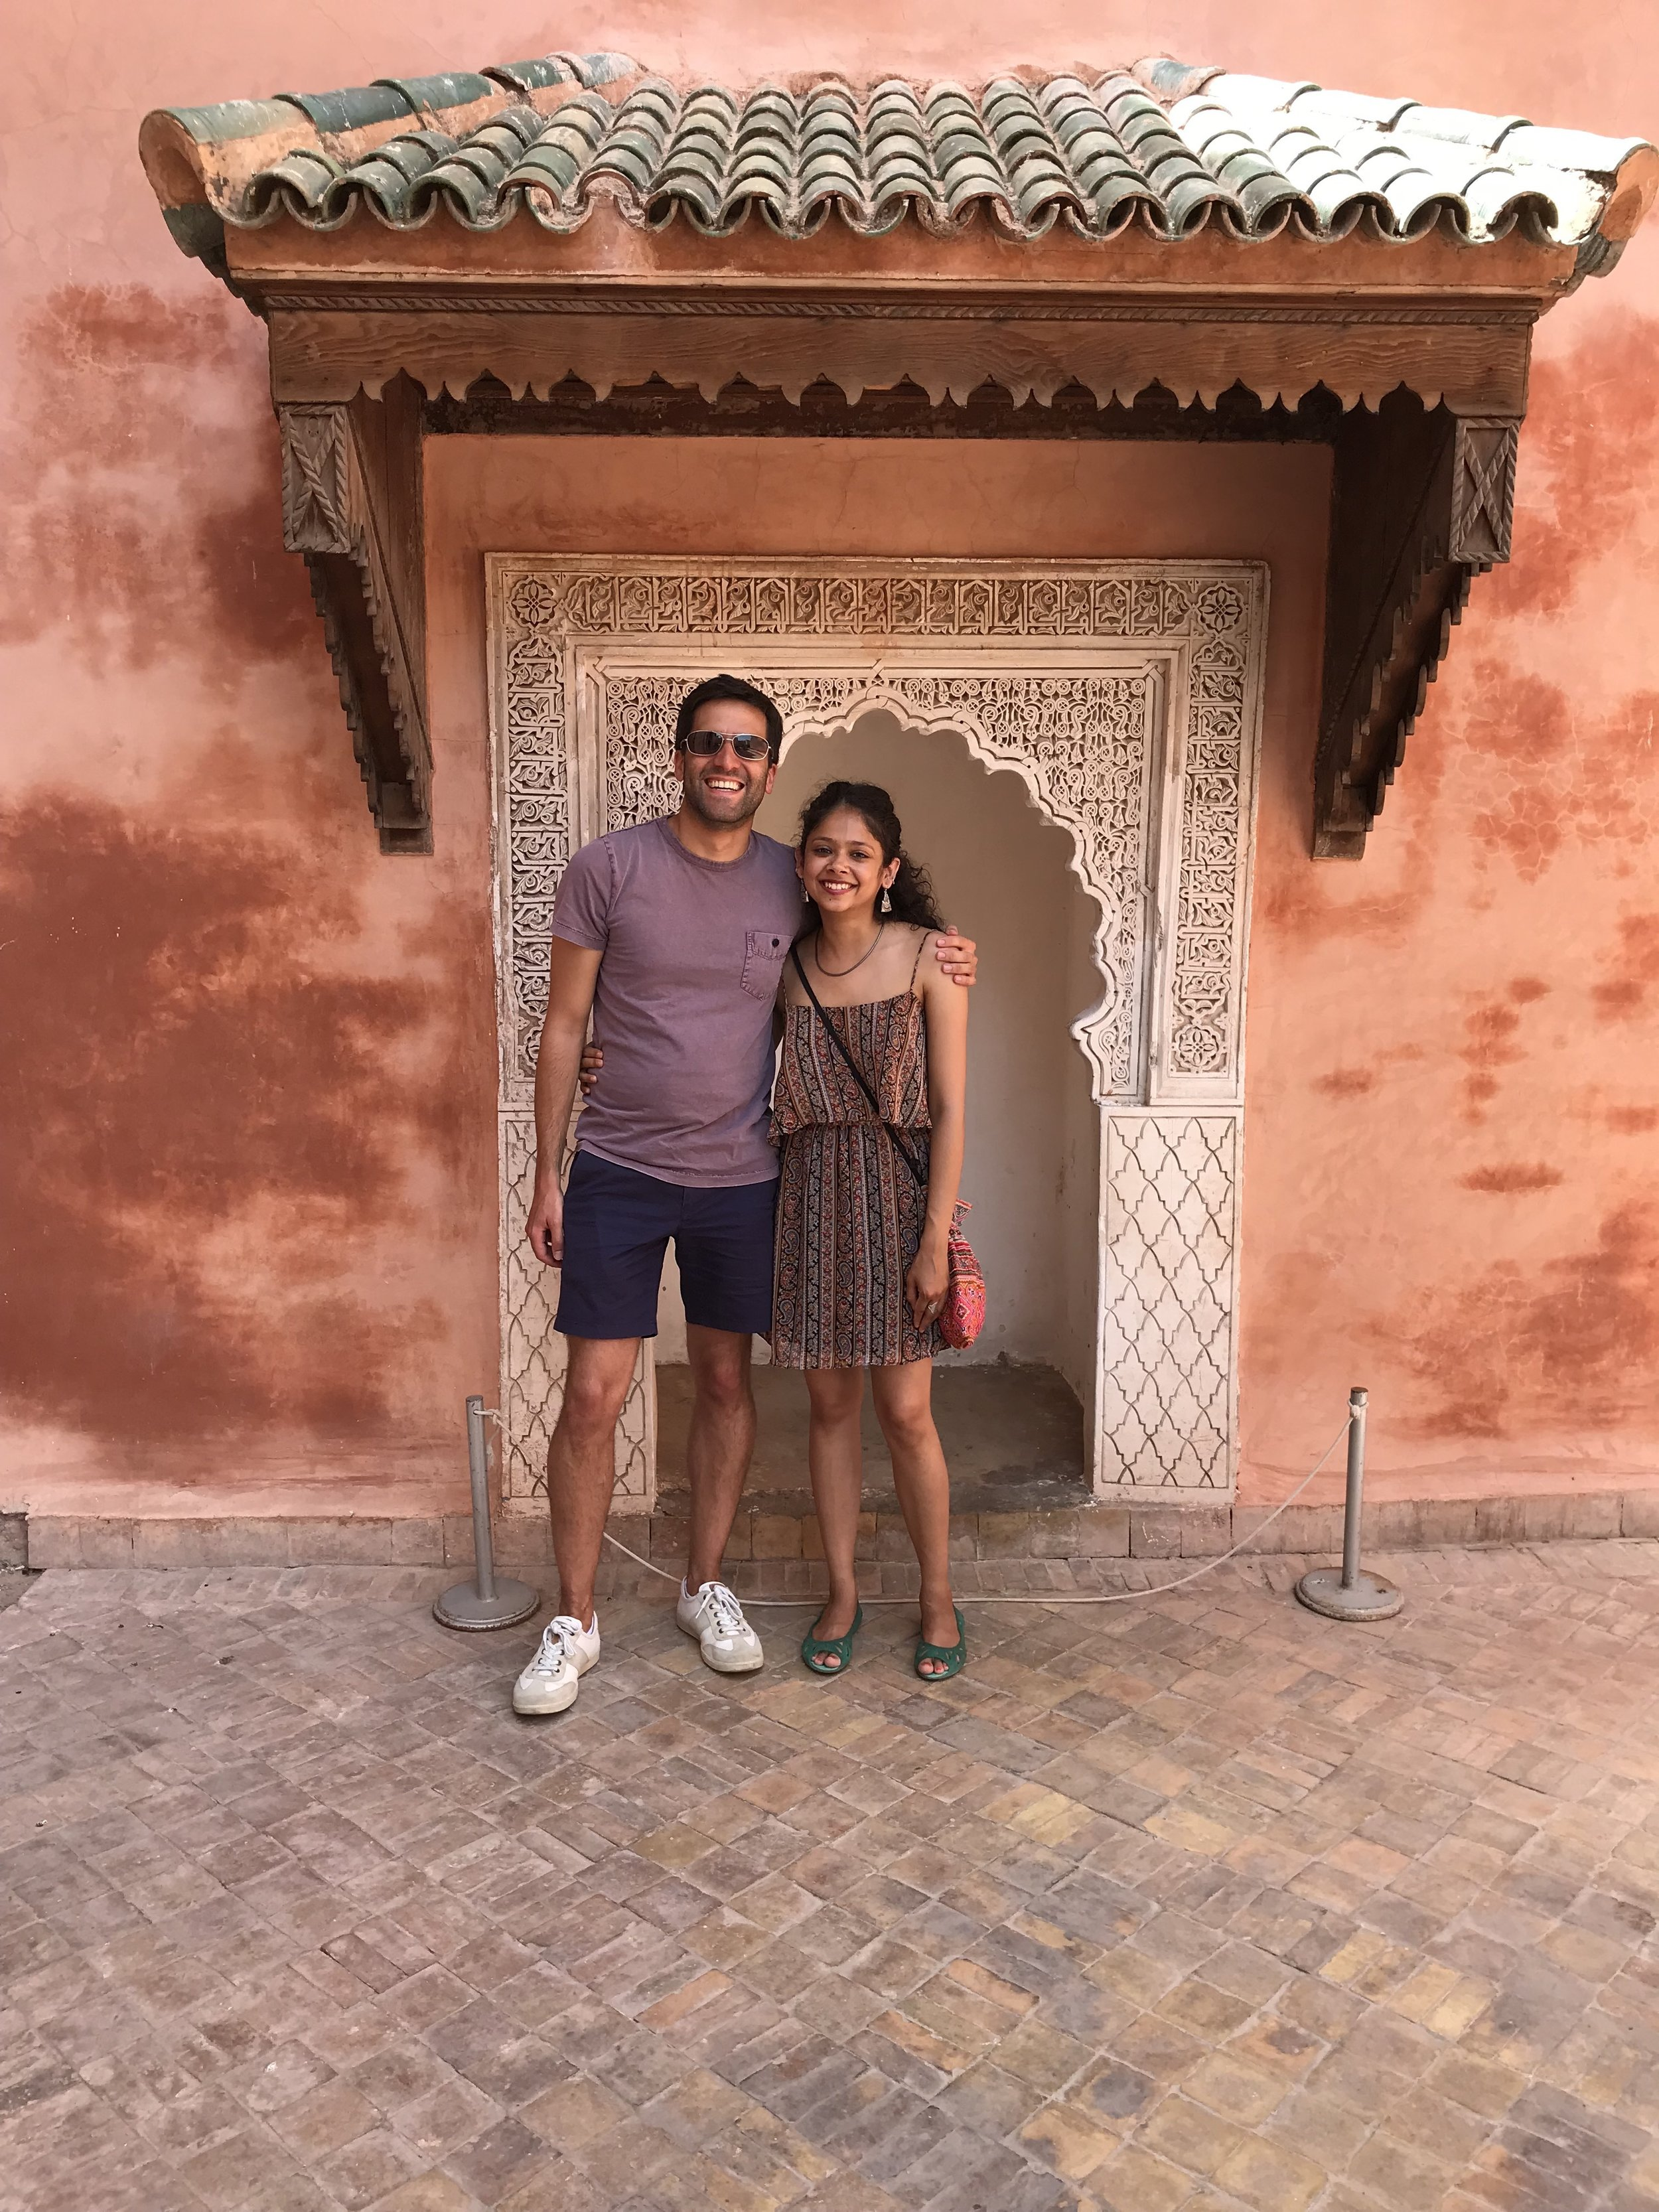 Anisha and Zach in Marrakech